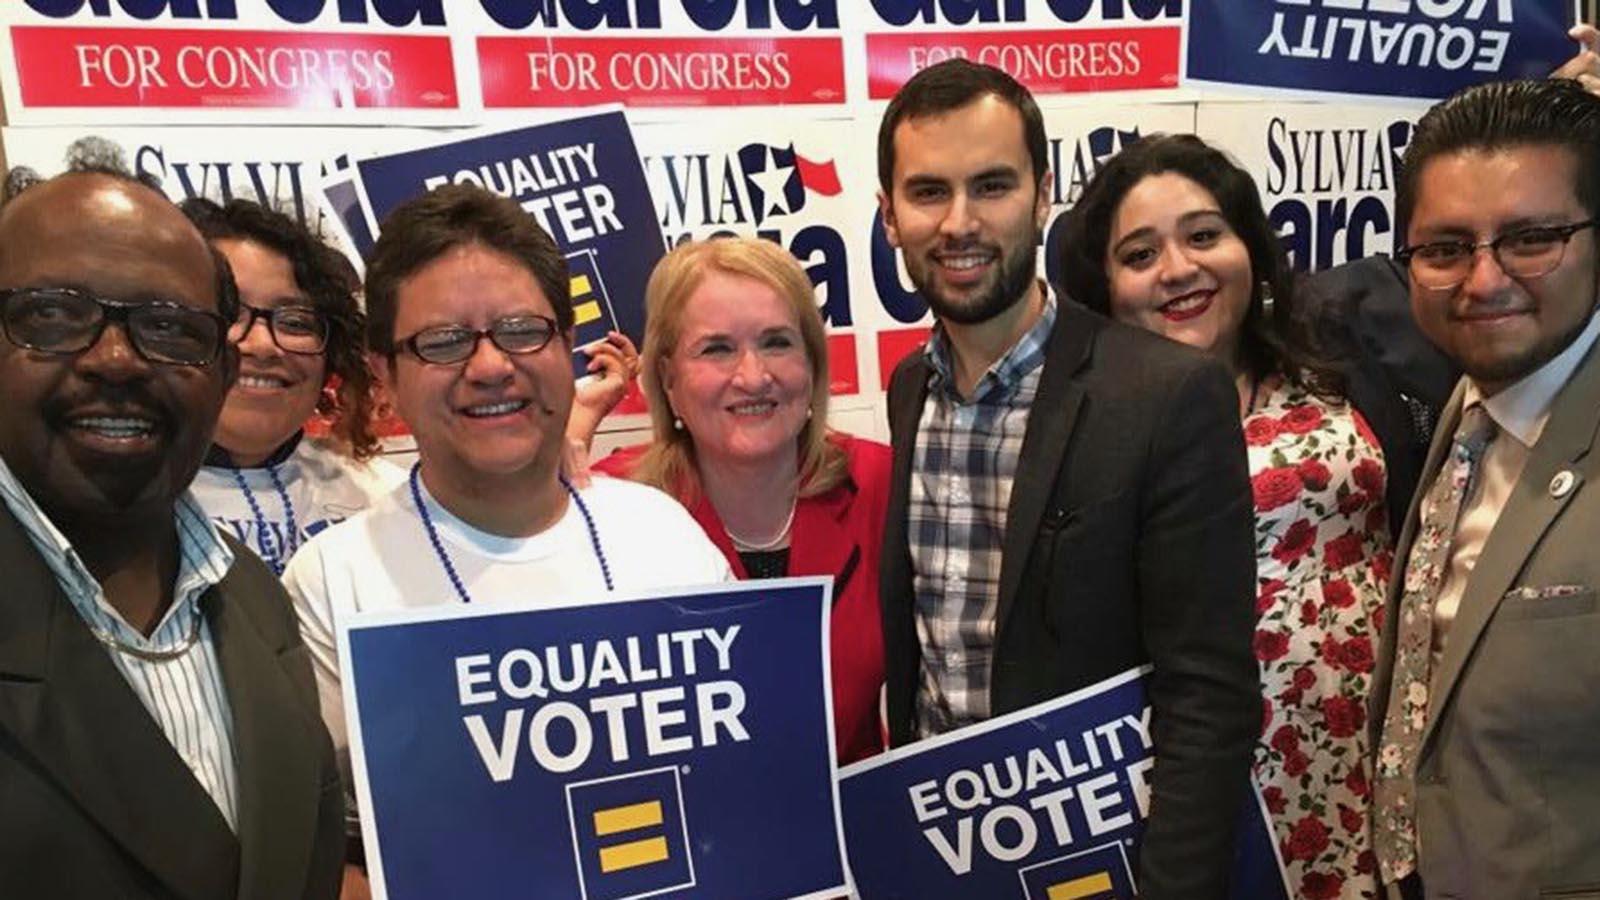 Washington State's marriage equality bill SB 6239